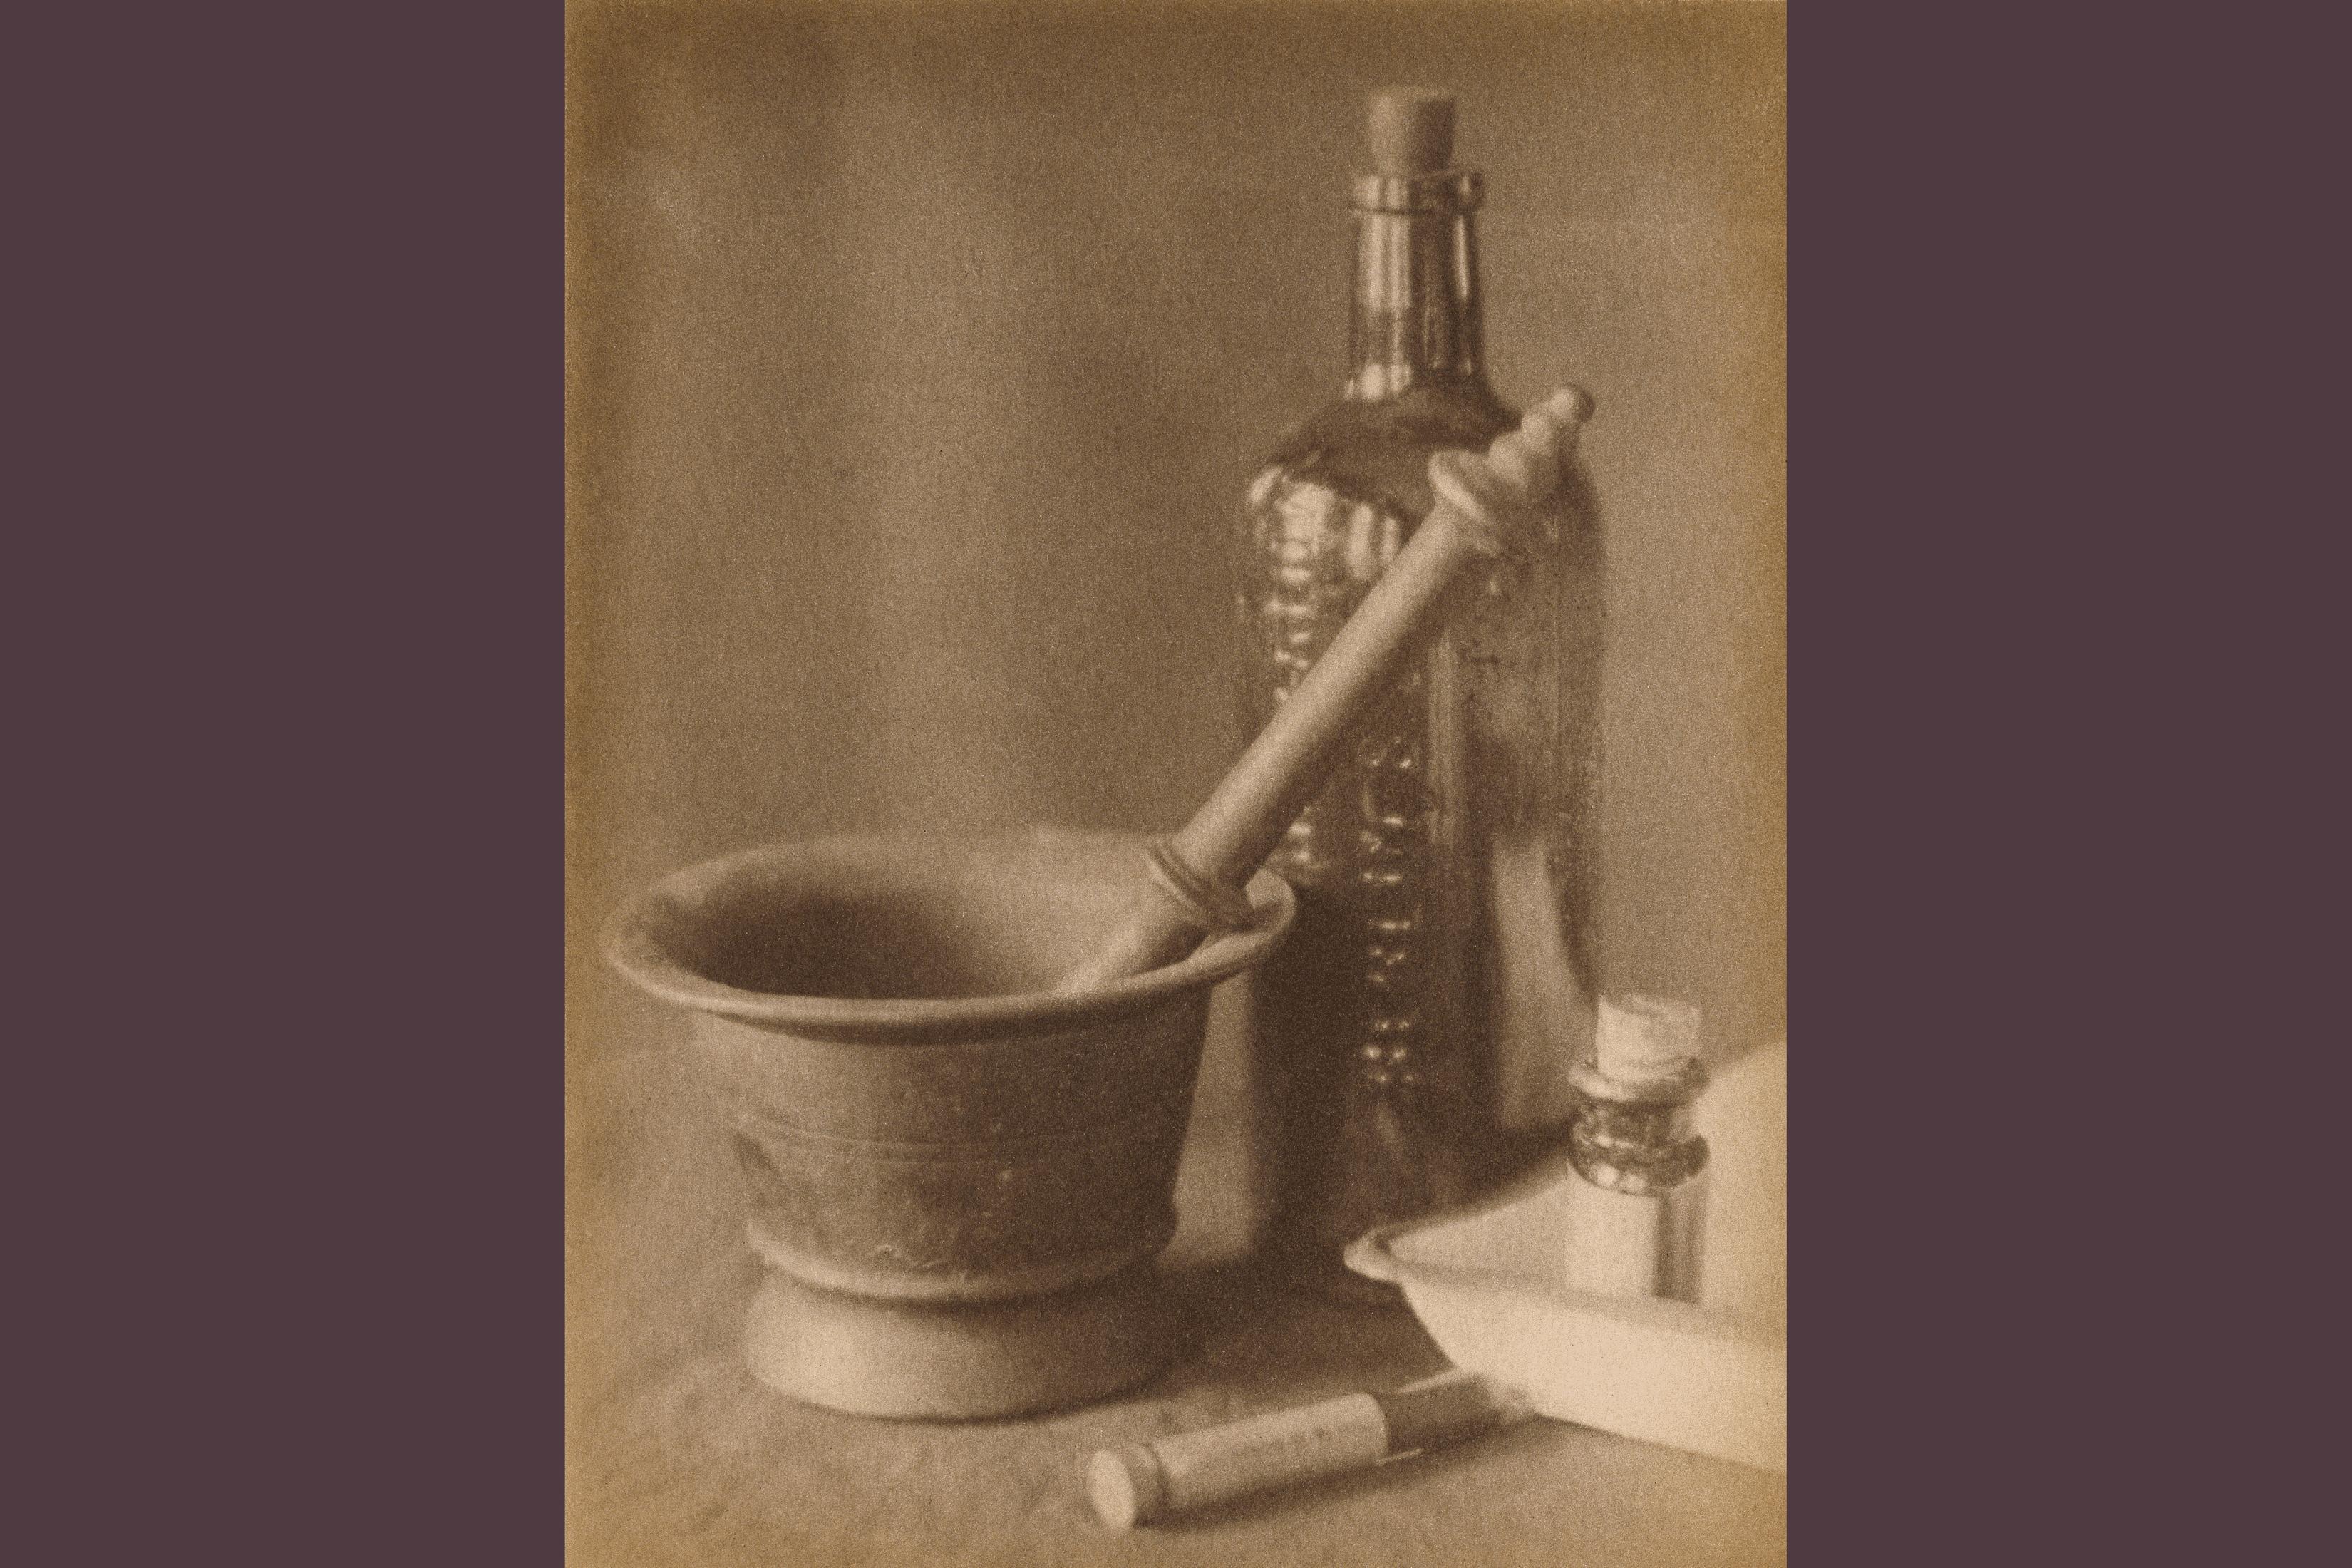 Darkroom Still Life by Doris Ulmann; platinum print, 1918